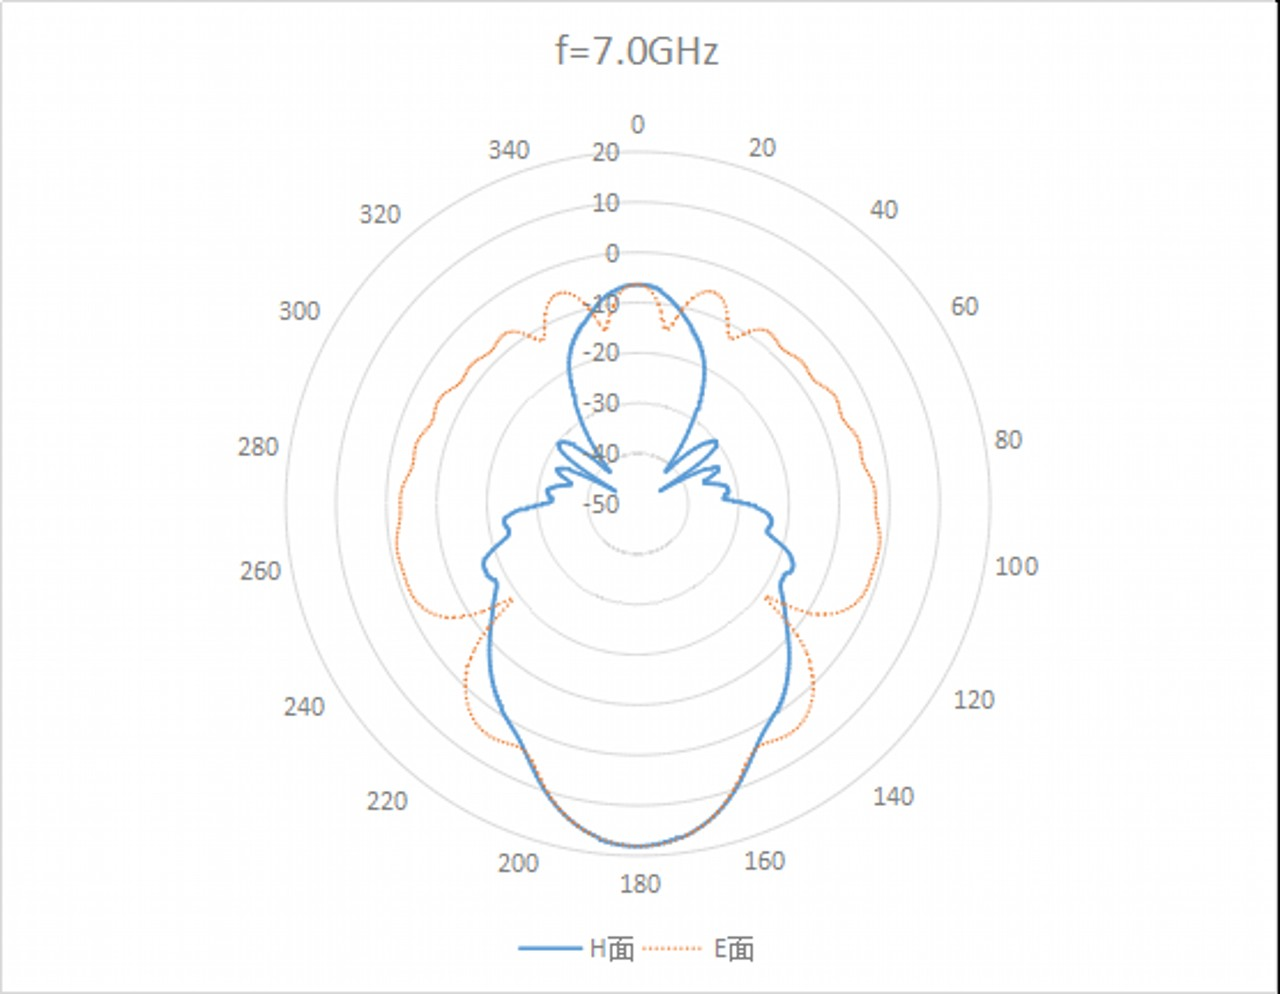 WR-159 Waveguide Standard Gain Horn Antenna. Nominal Gain: 15 dBi Gain. Frequency Range: 4.9 GHz to 7.1 GHz - 2